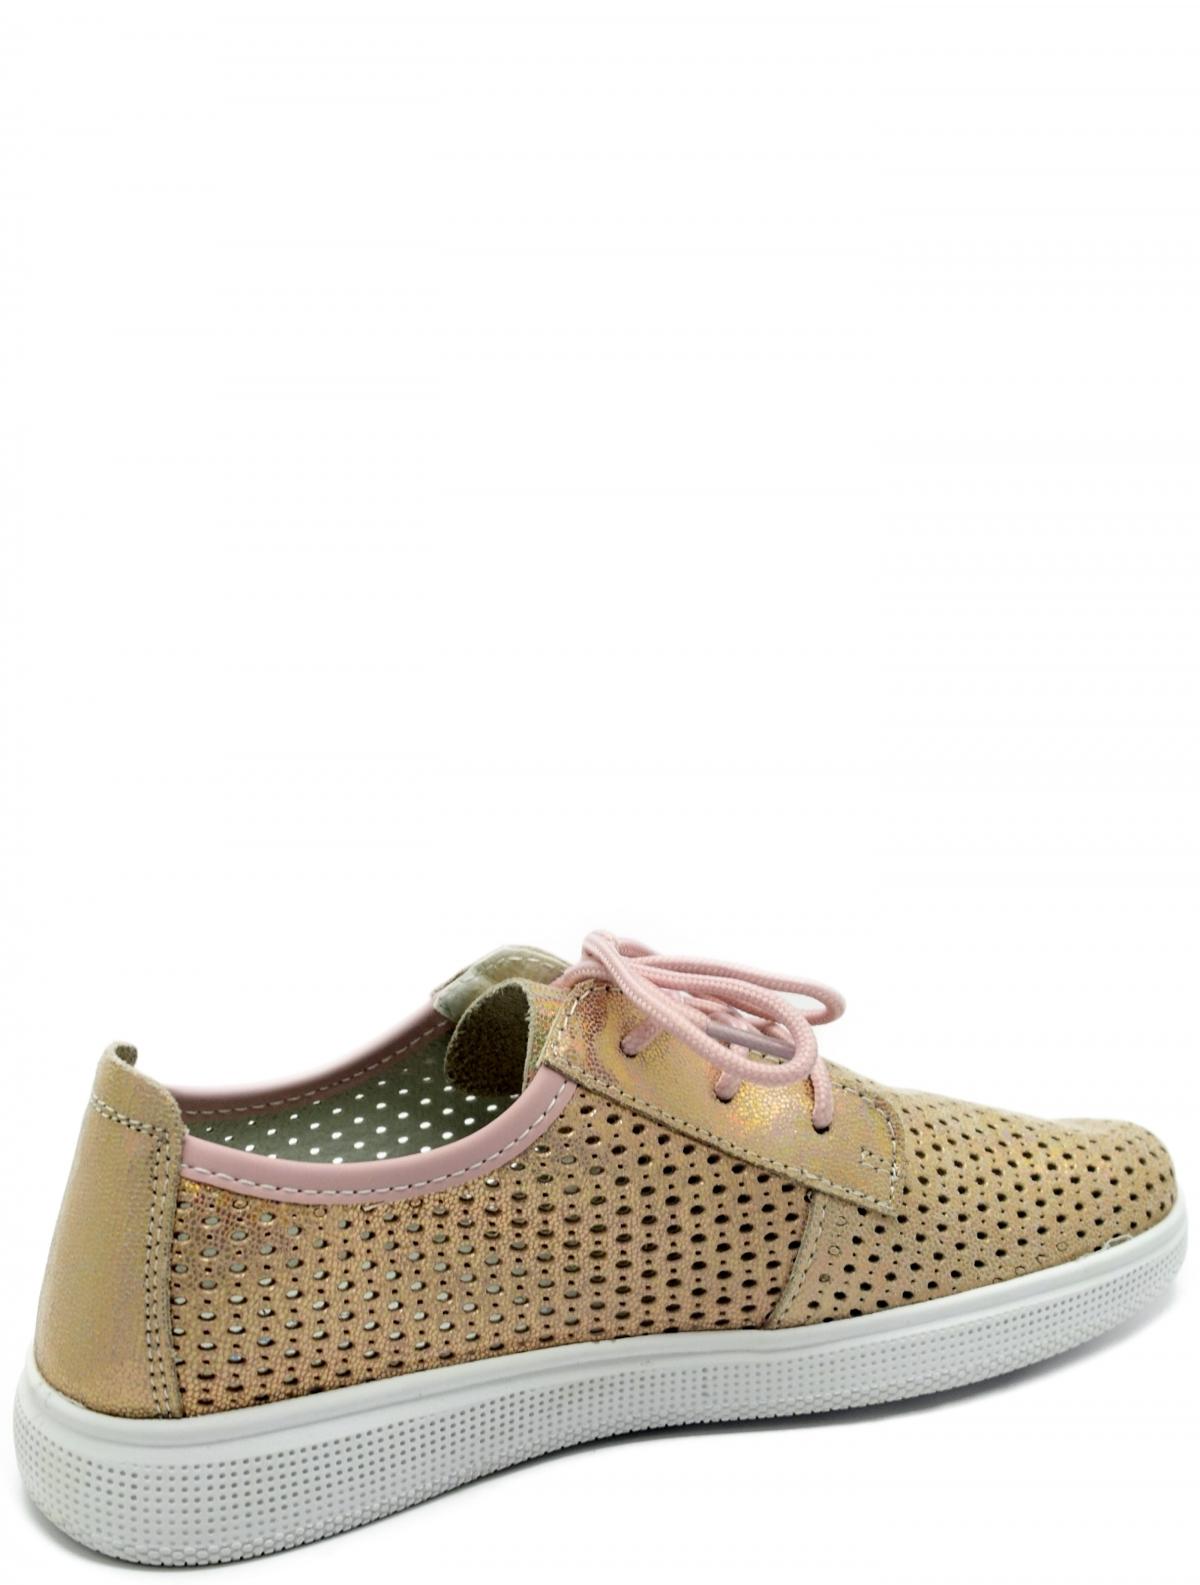 Rio Fiore 8240B-P женские кроссовки